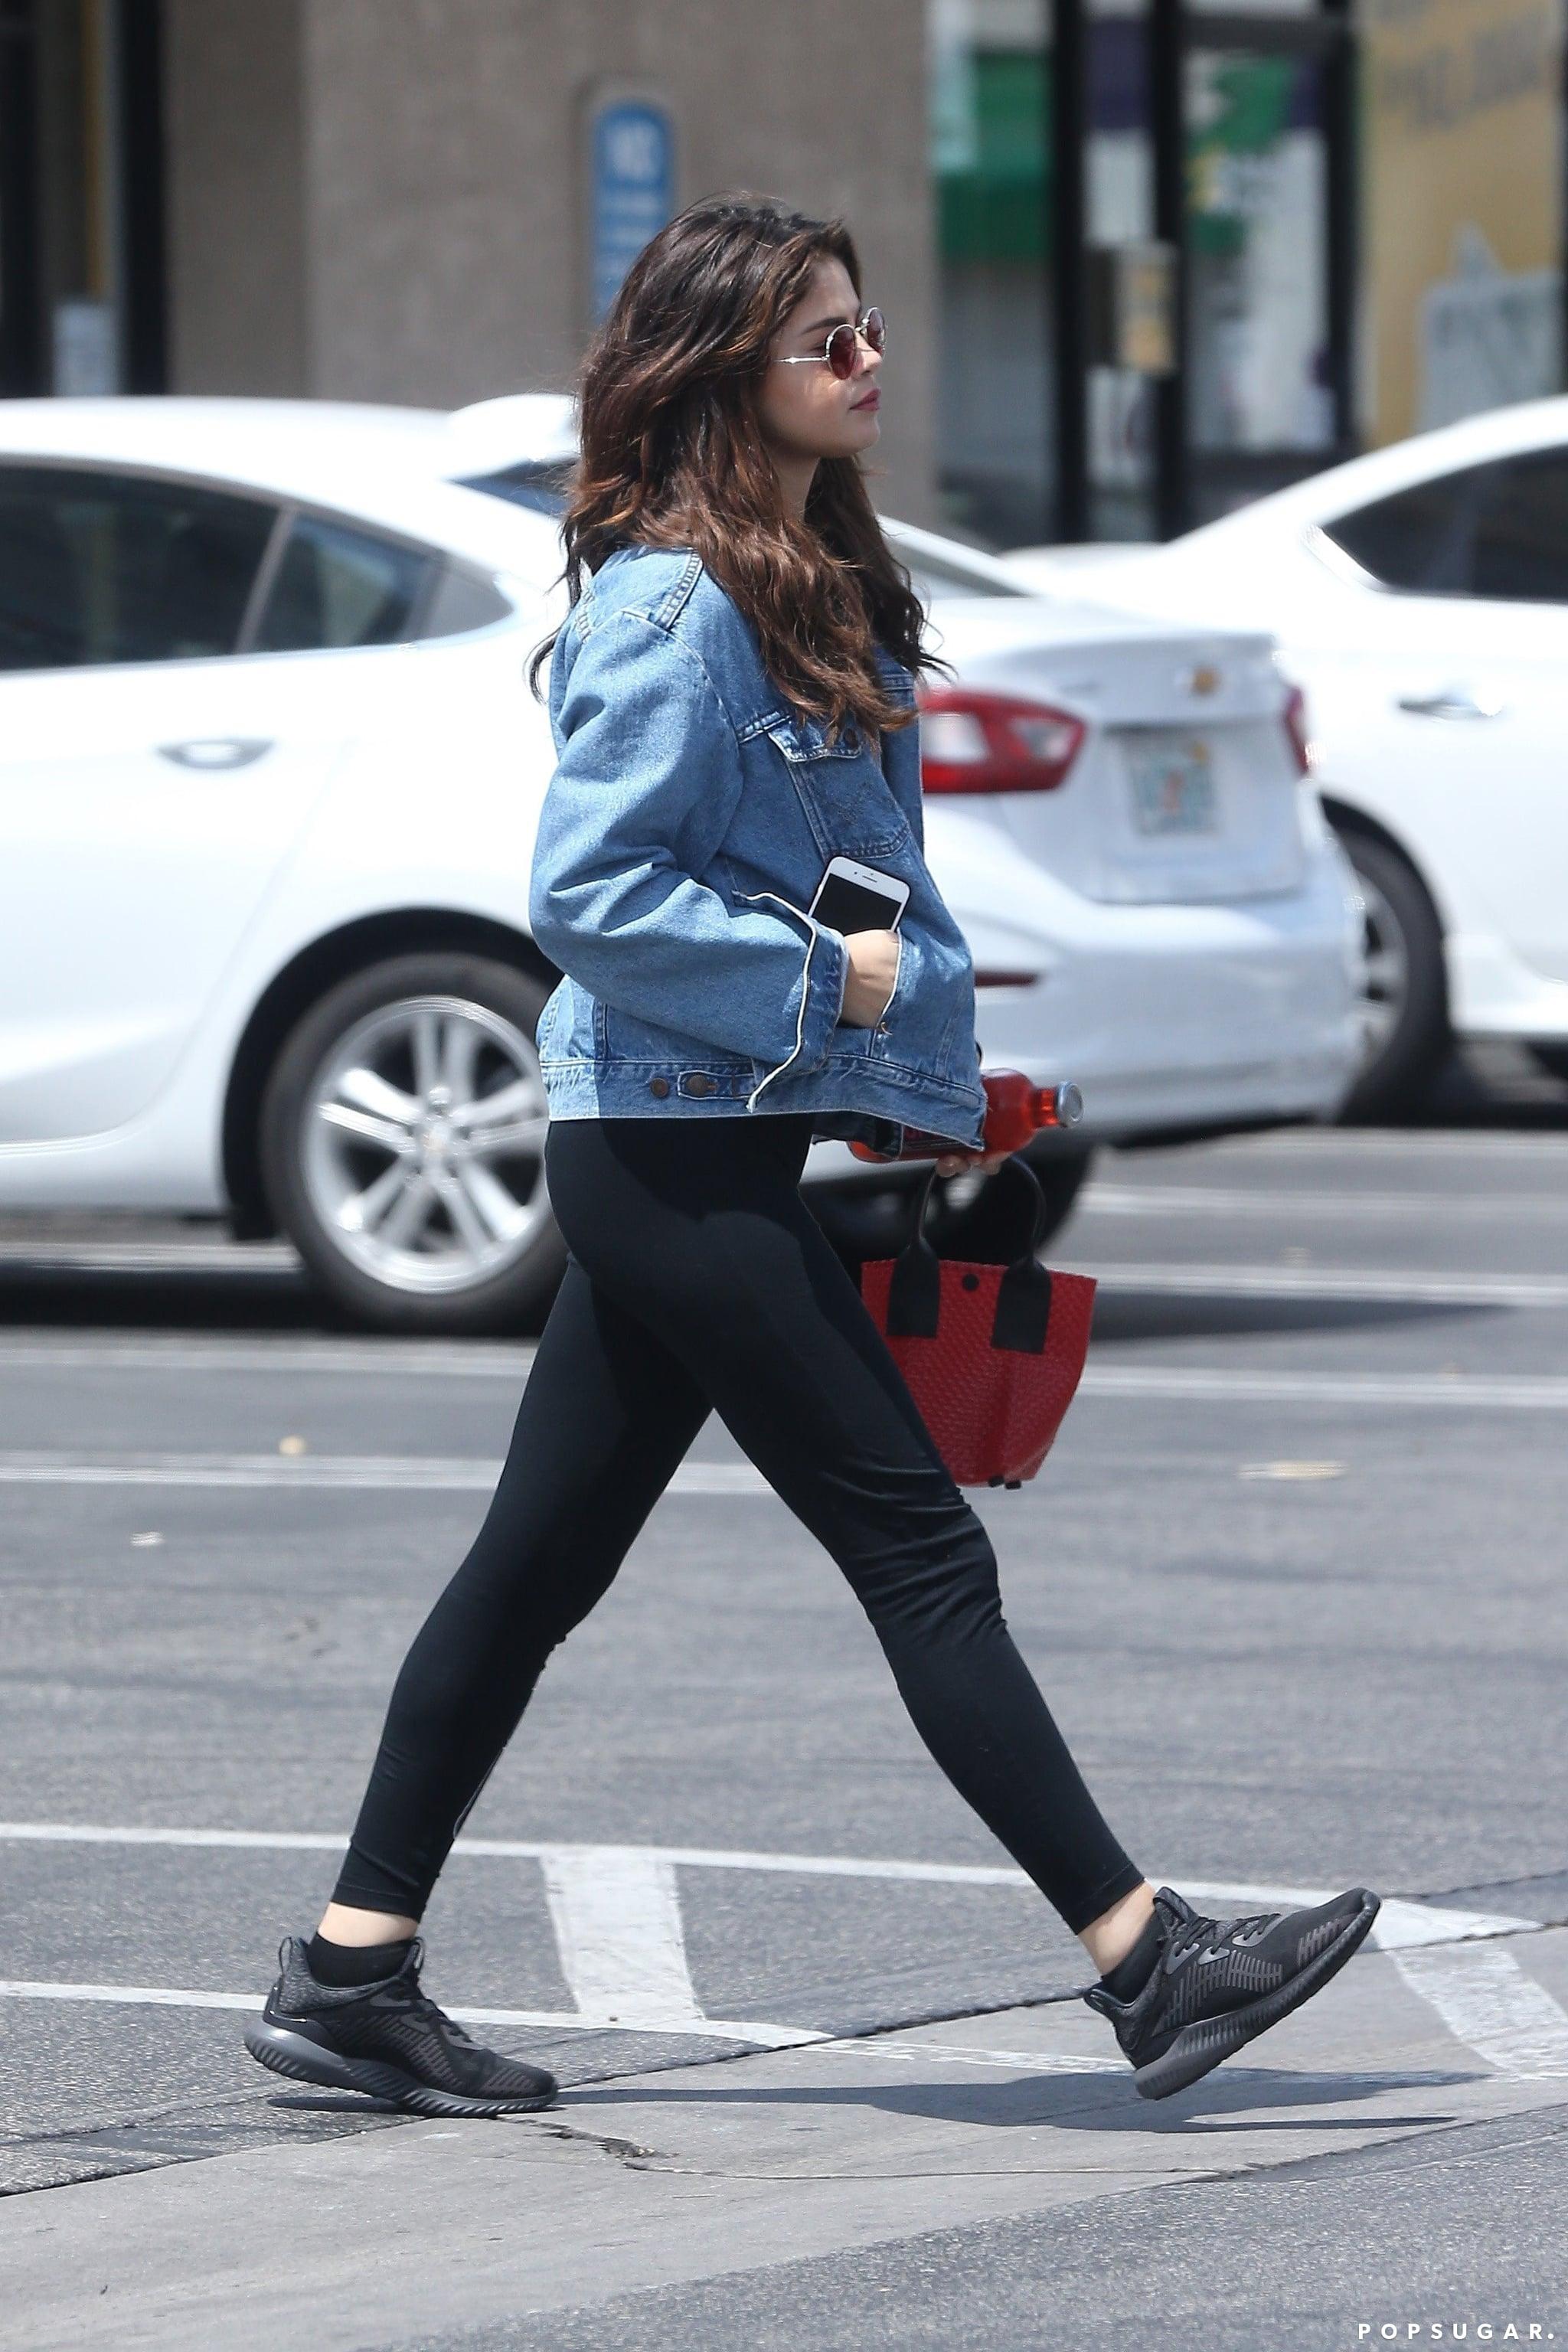 All-Black Running Shoes | Selena Gomez